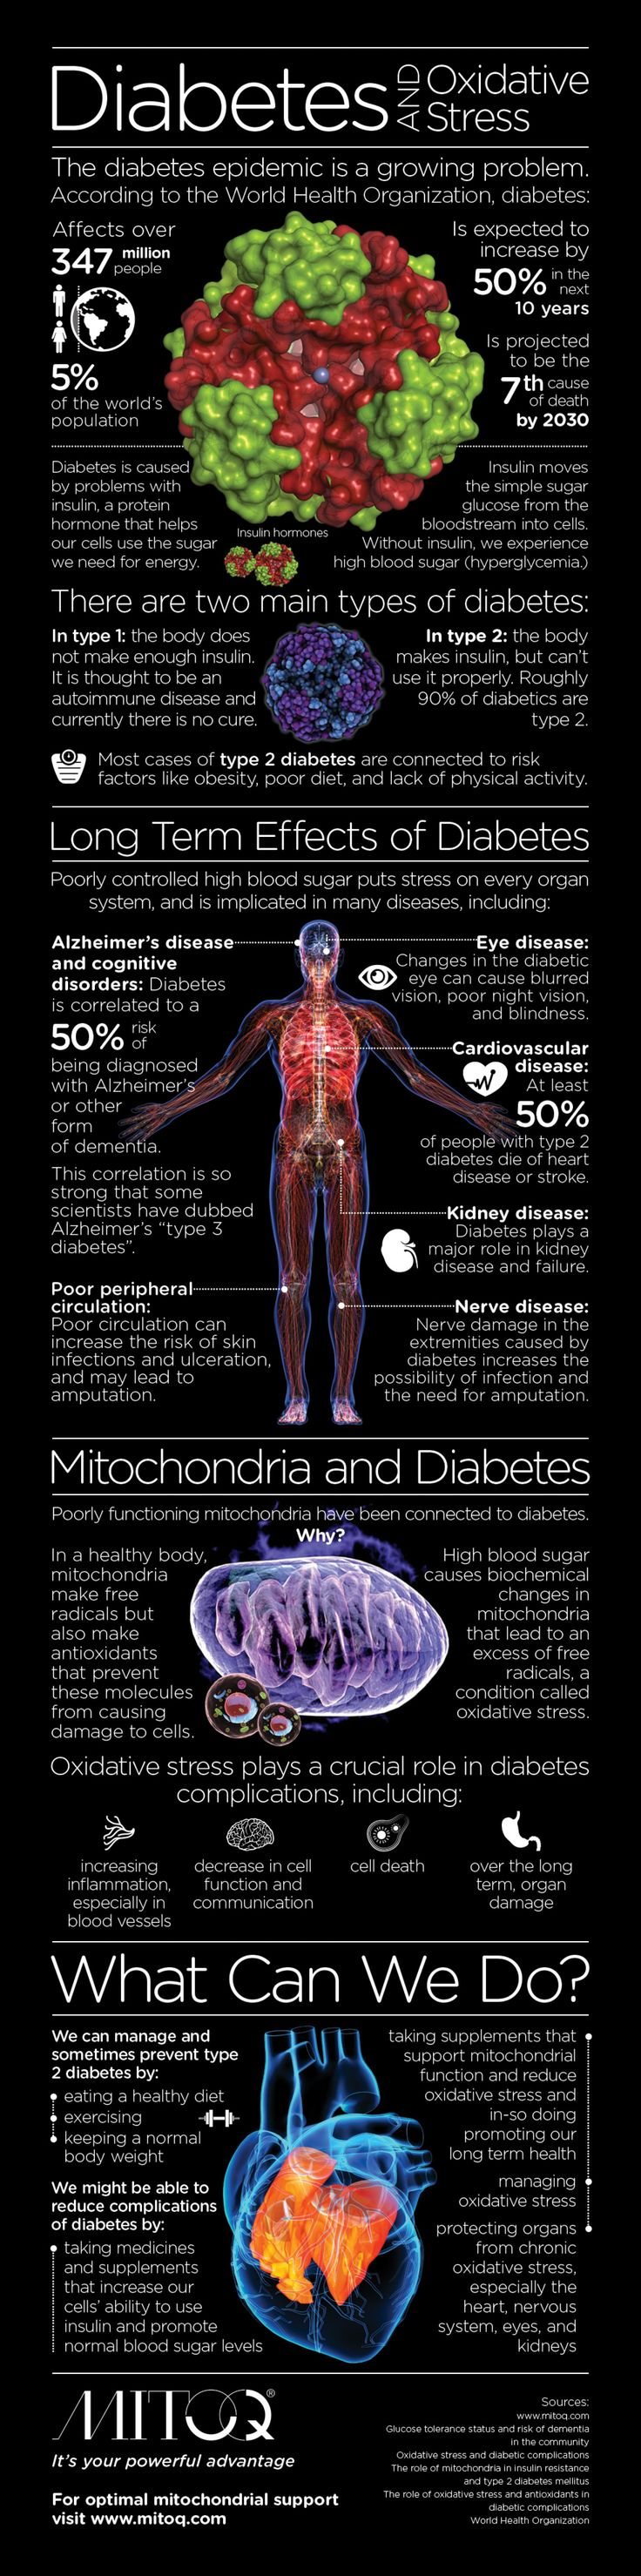 Diabetes and Oxidative Stress